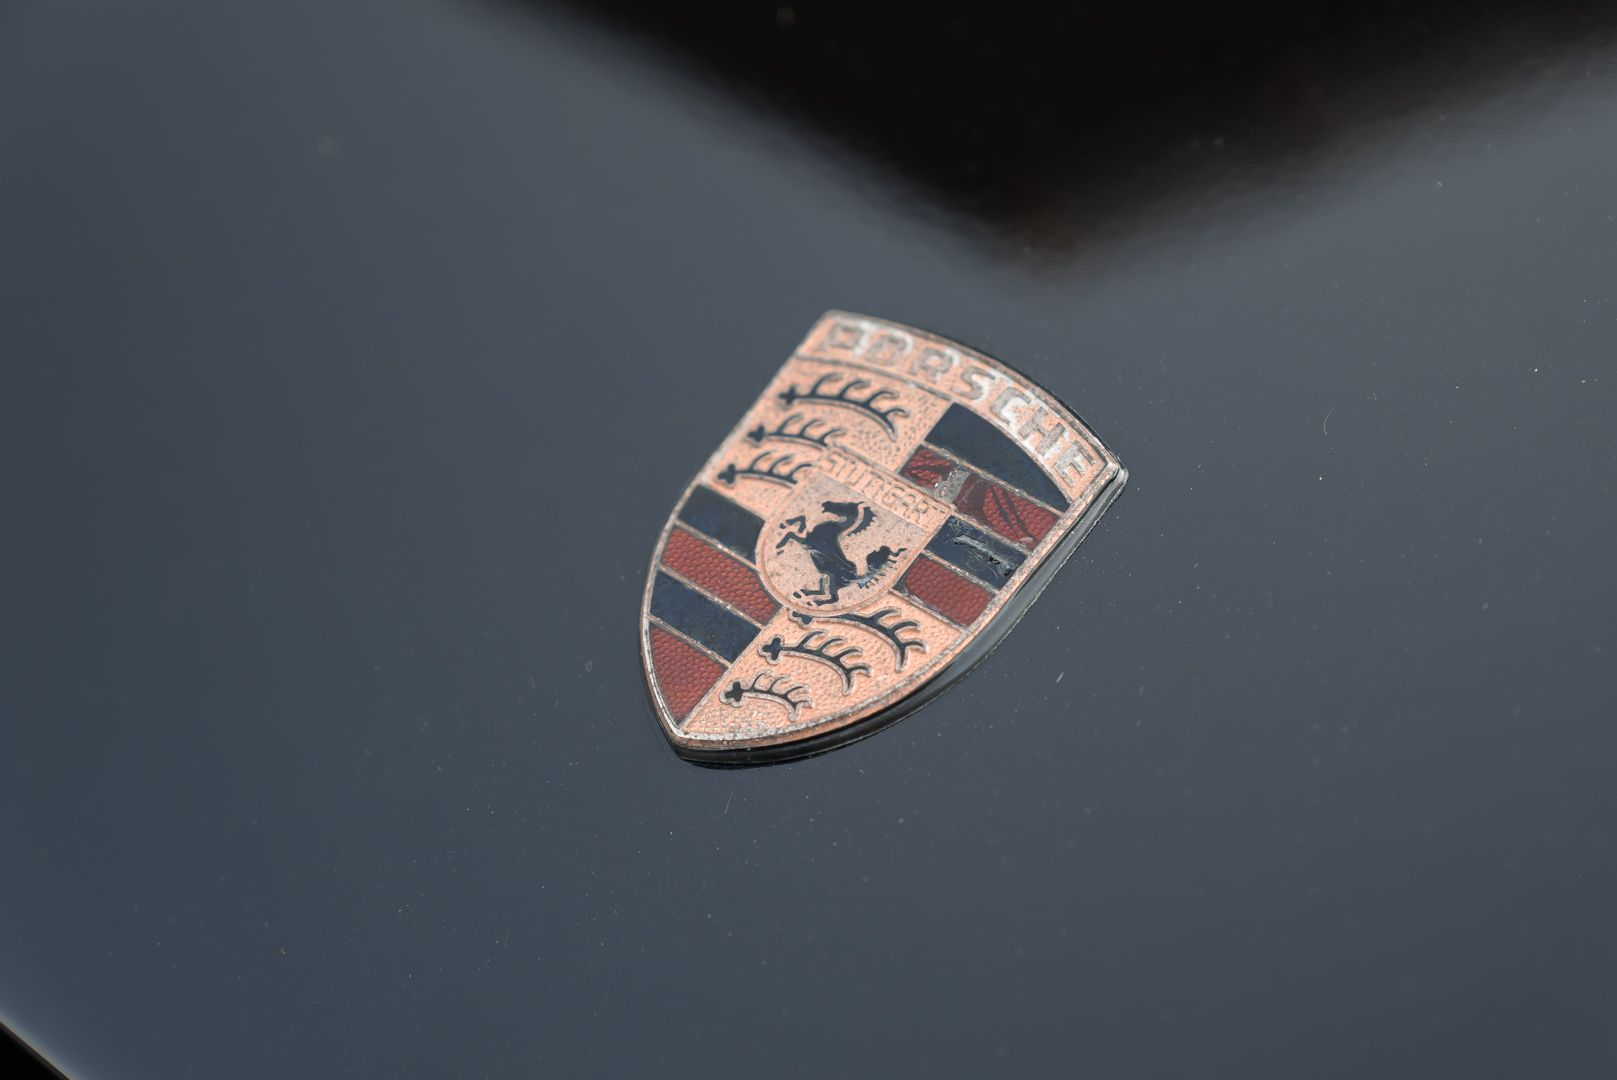 1994 Porsche 993 Carrera 3.6 78677